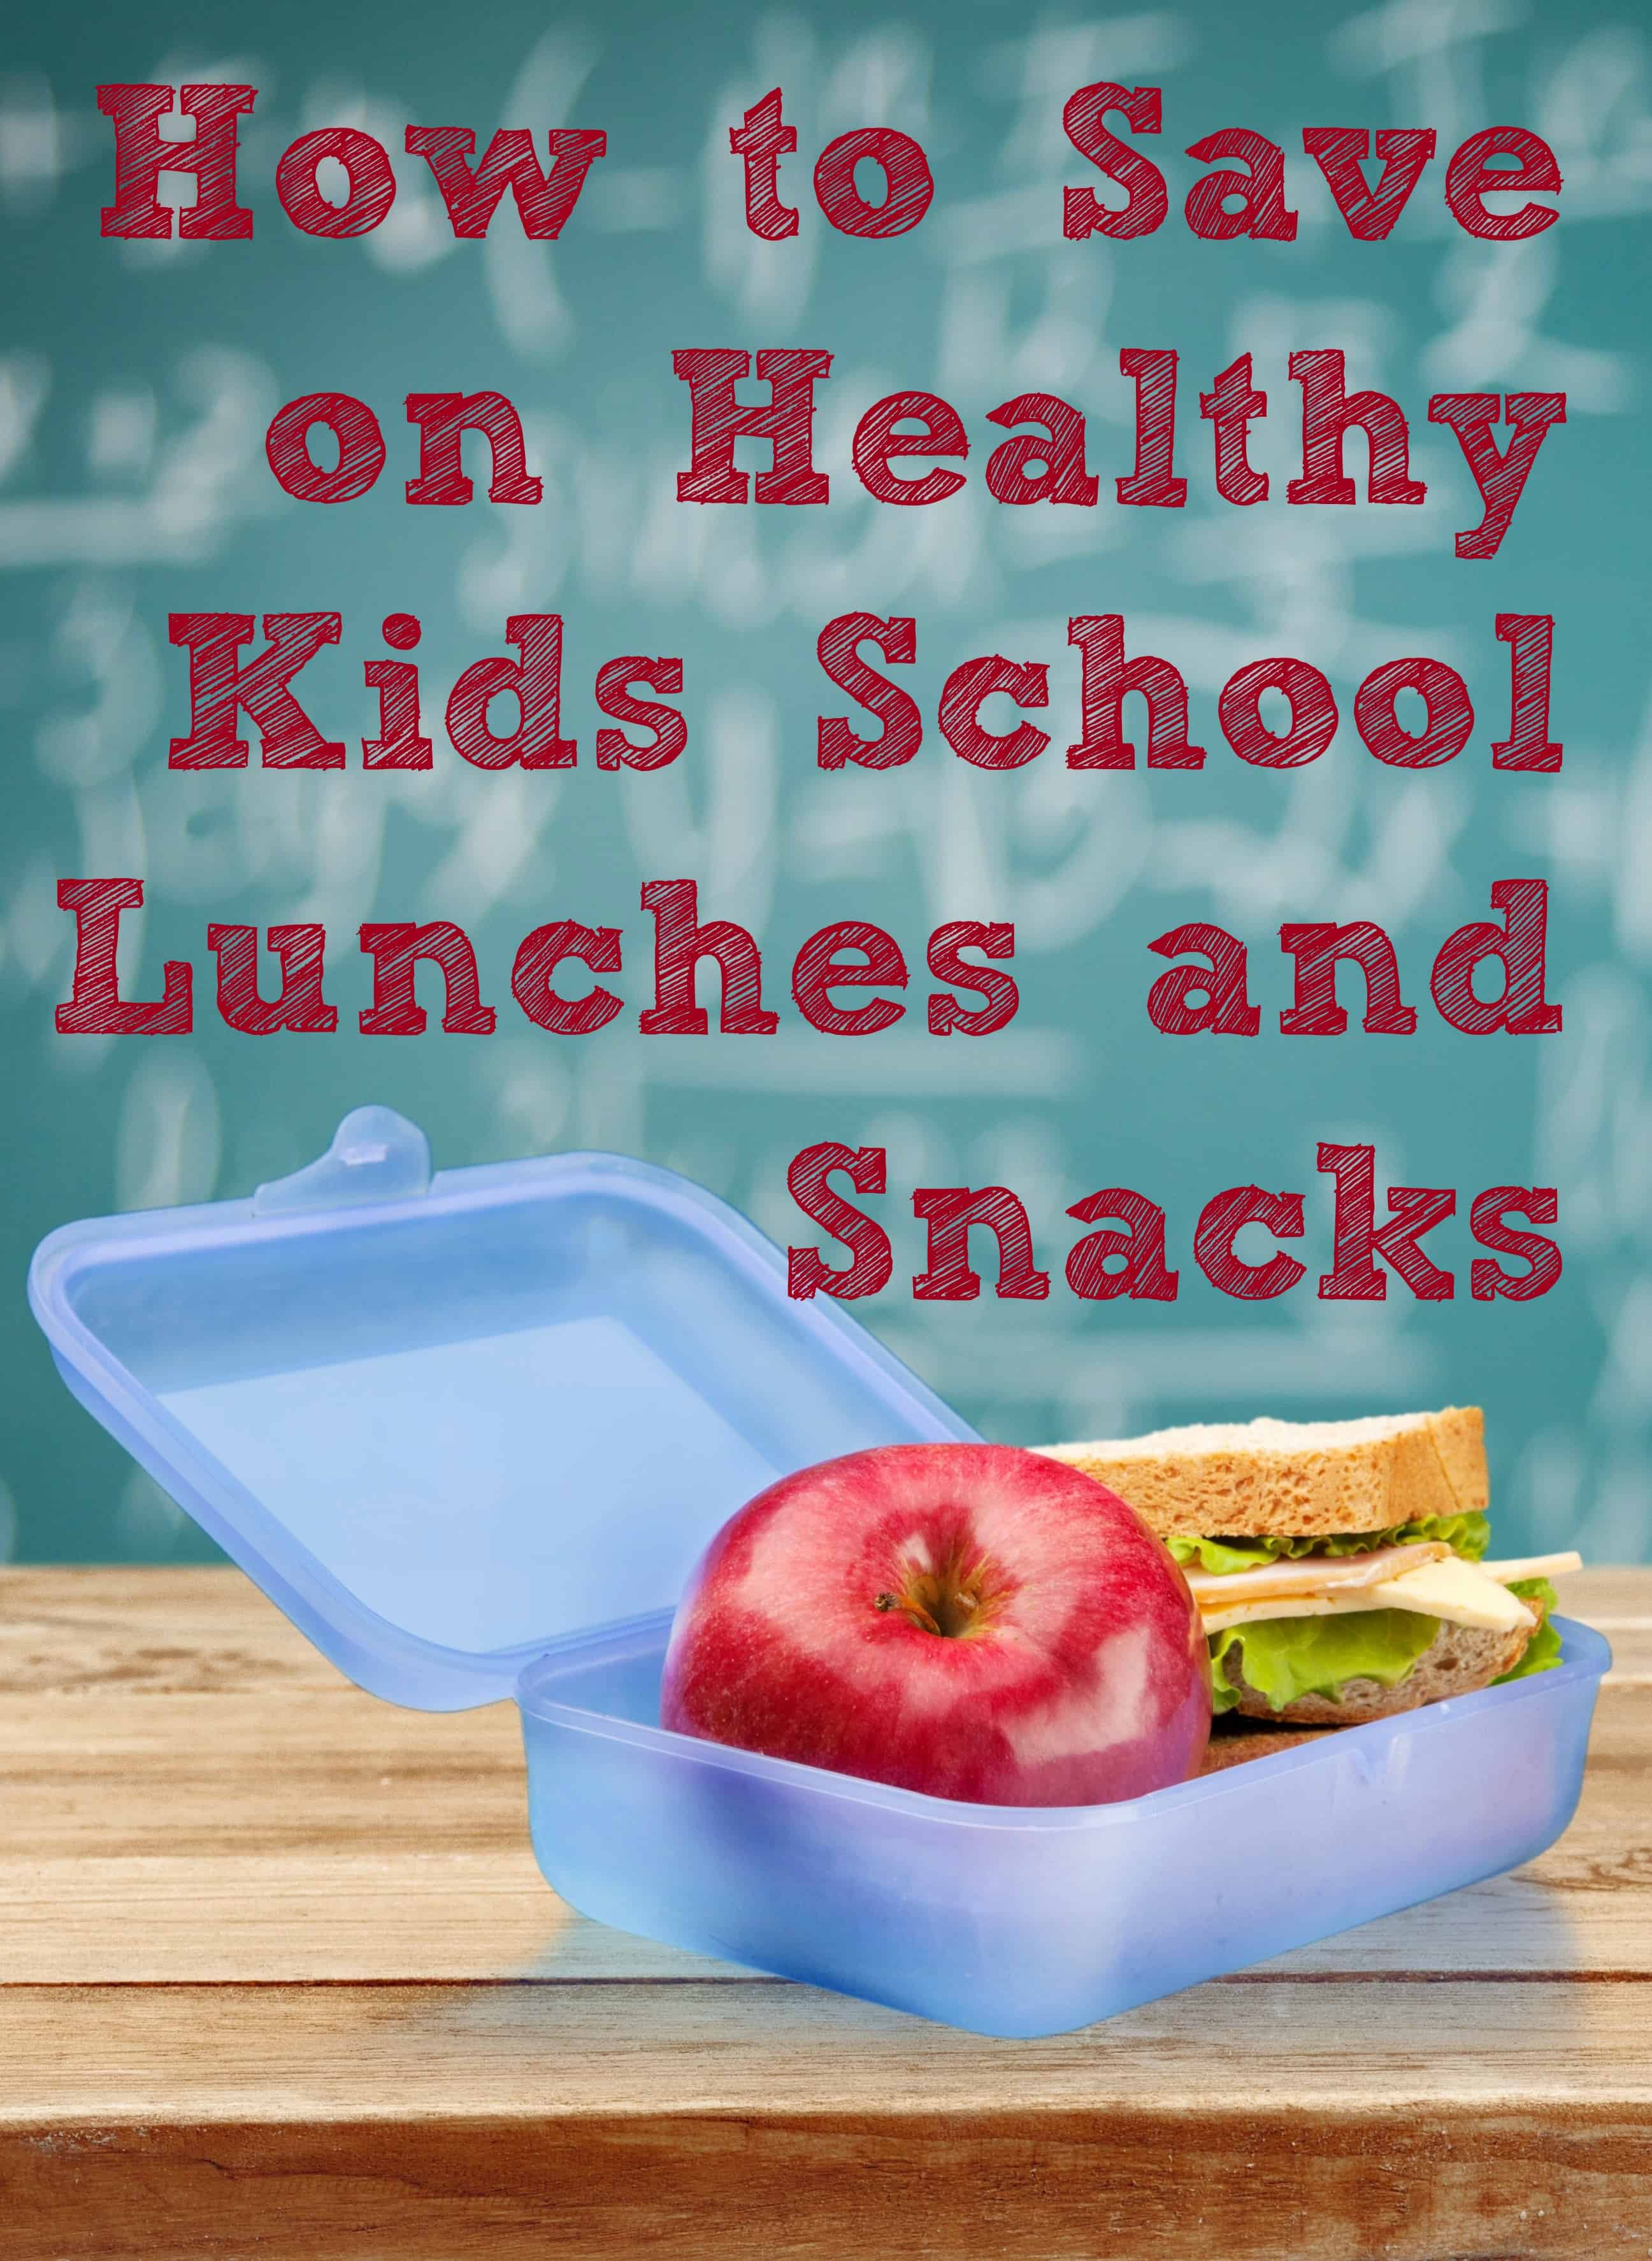 Lunch Box. School lunch